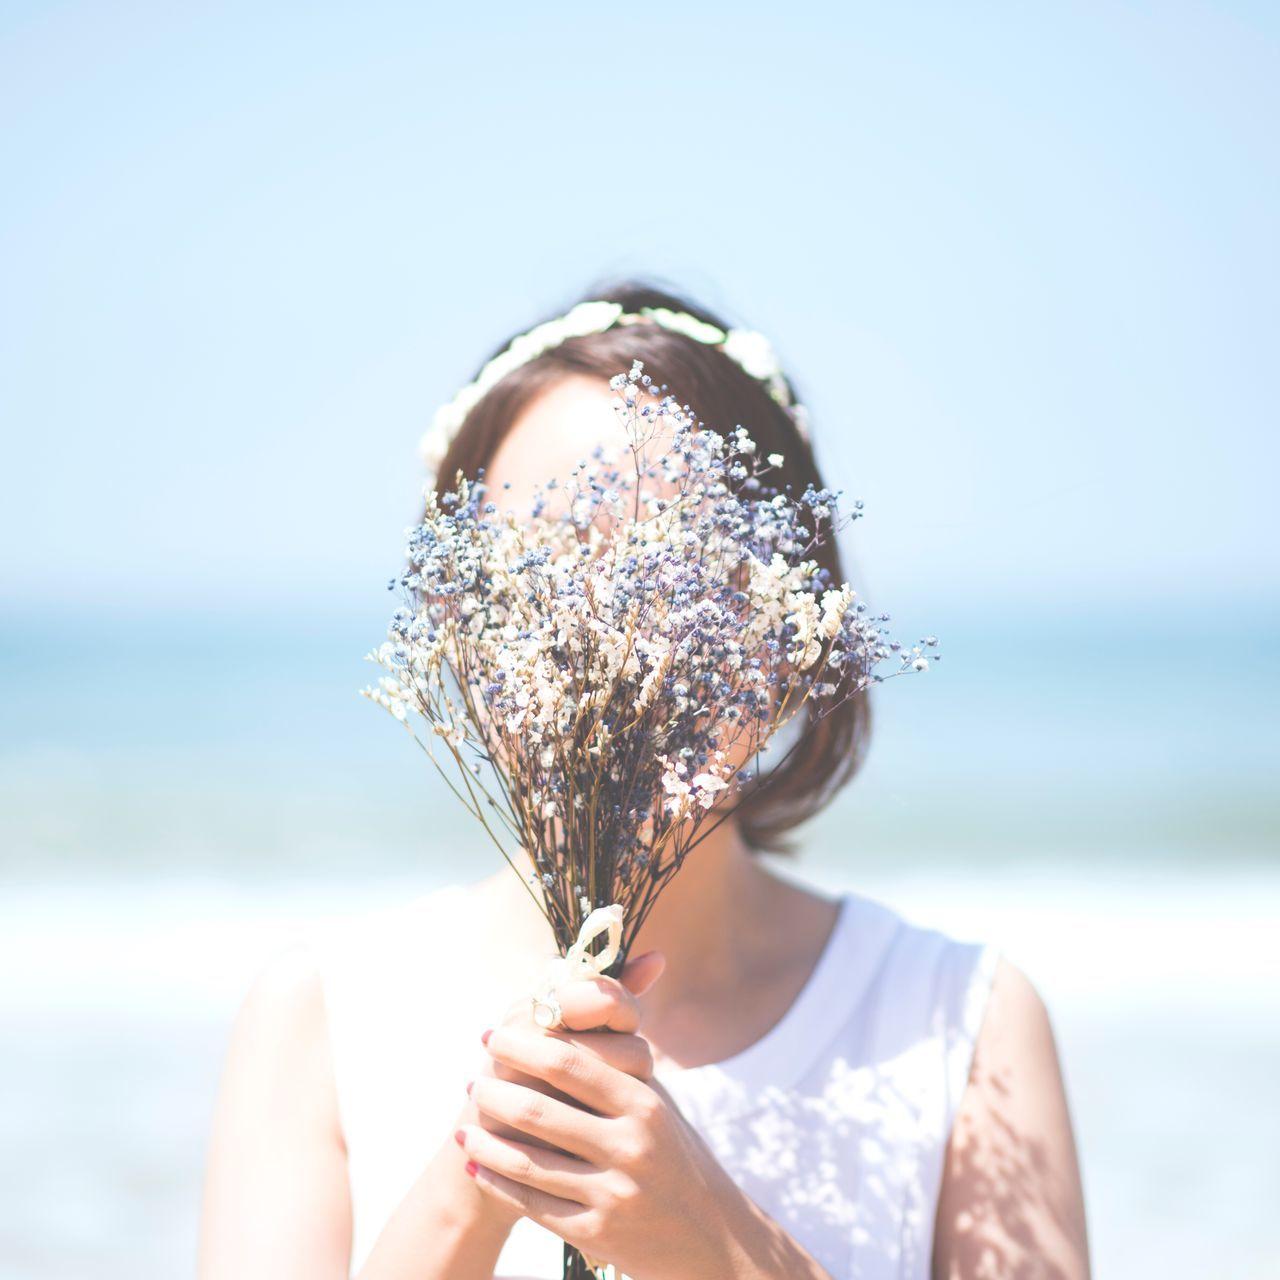 Sea Datesnap Snap Photo Selfwedding Flower Dry Flower